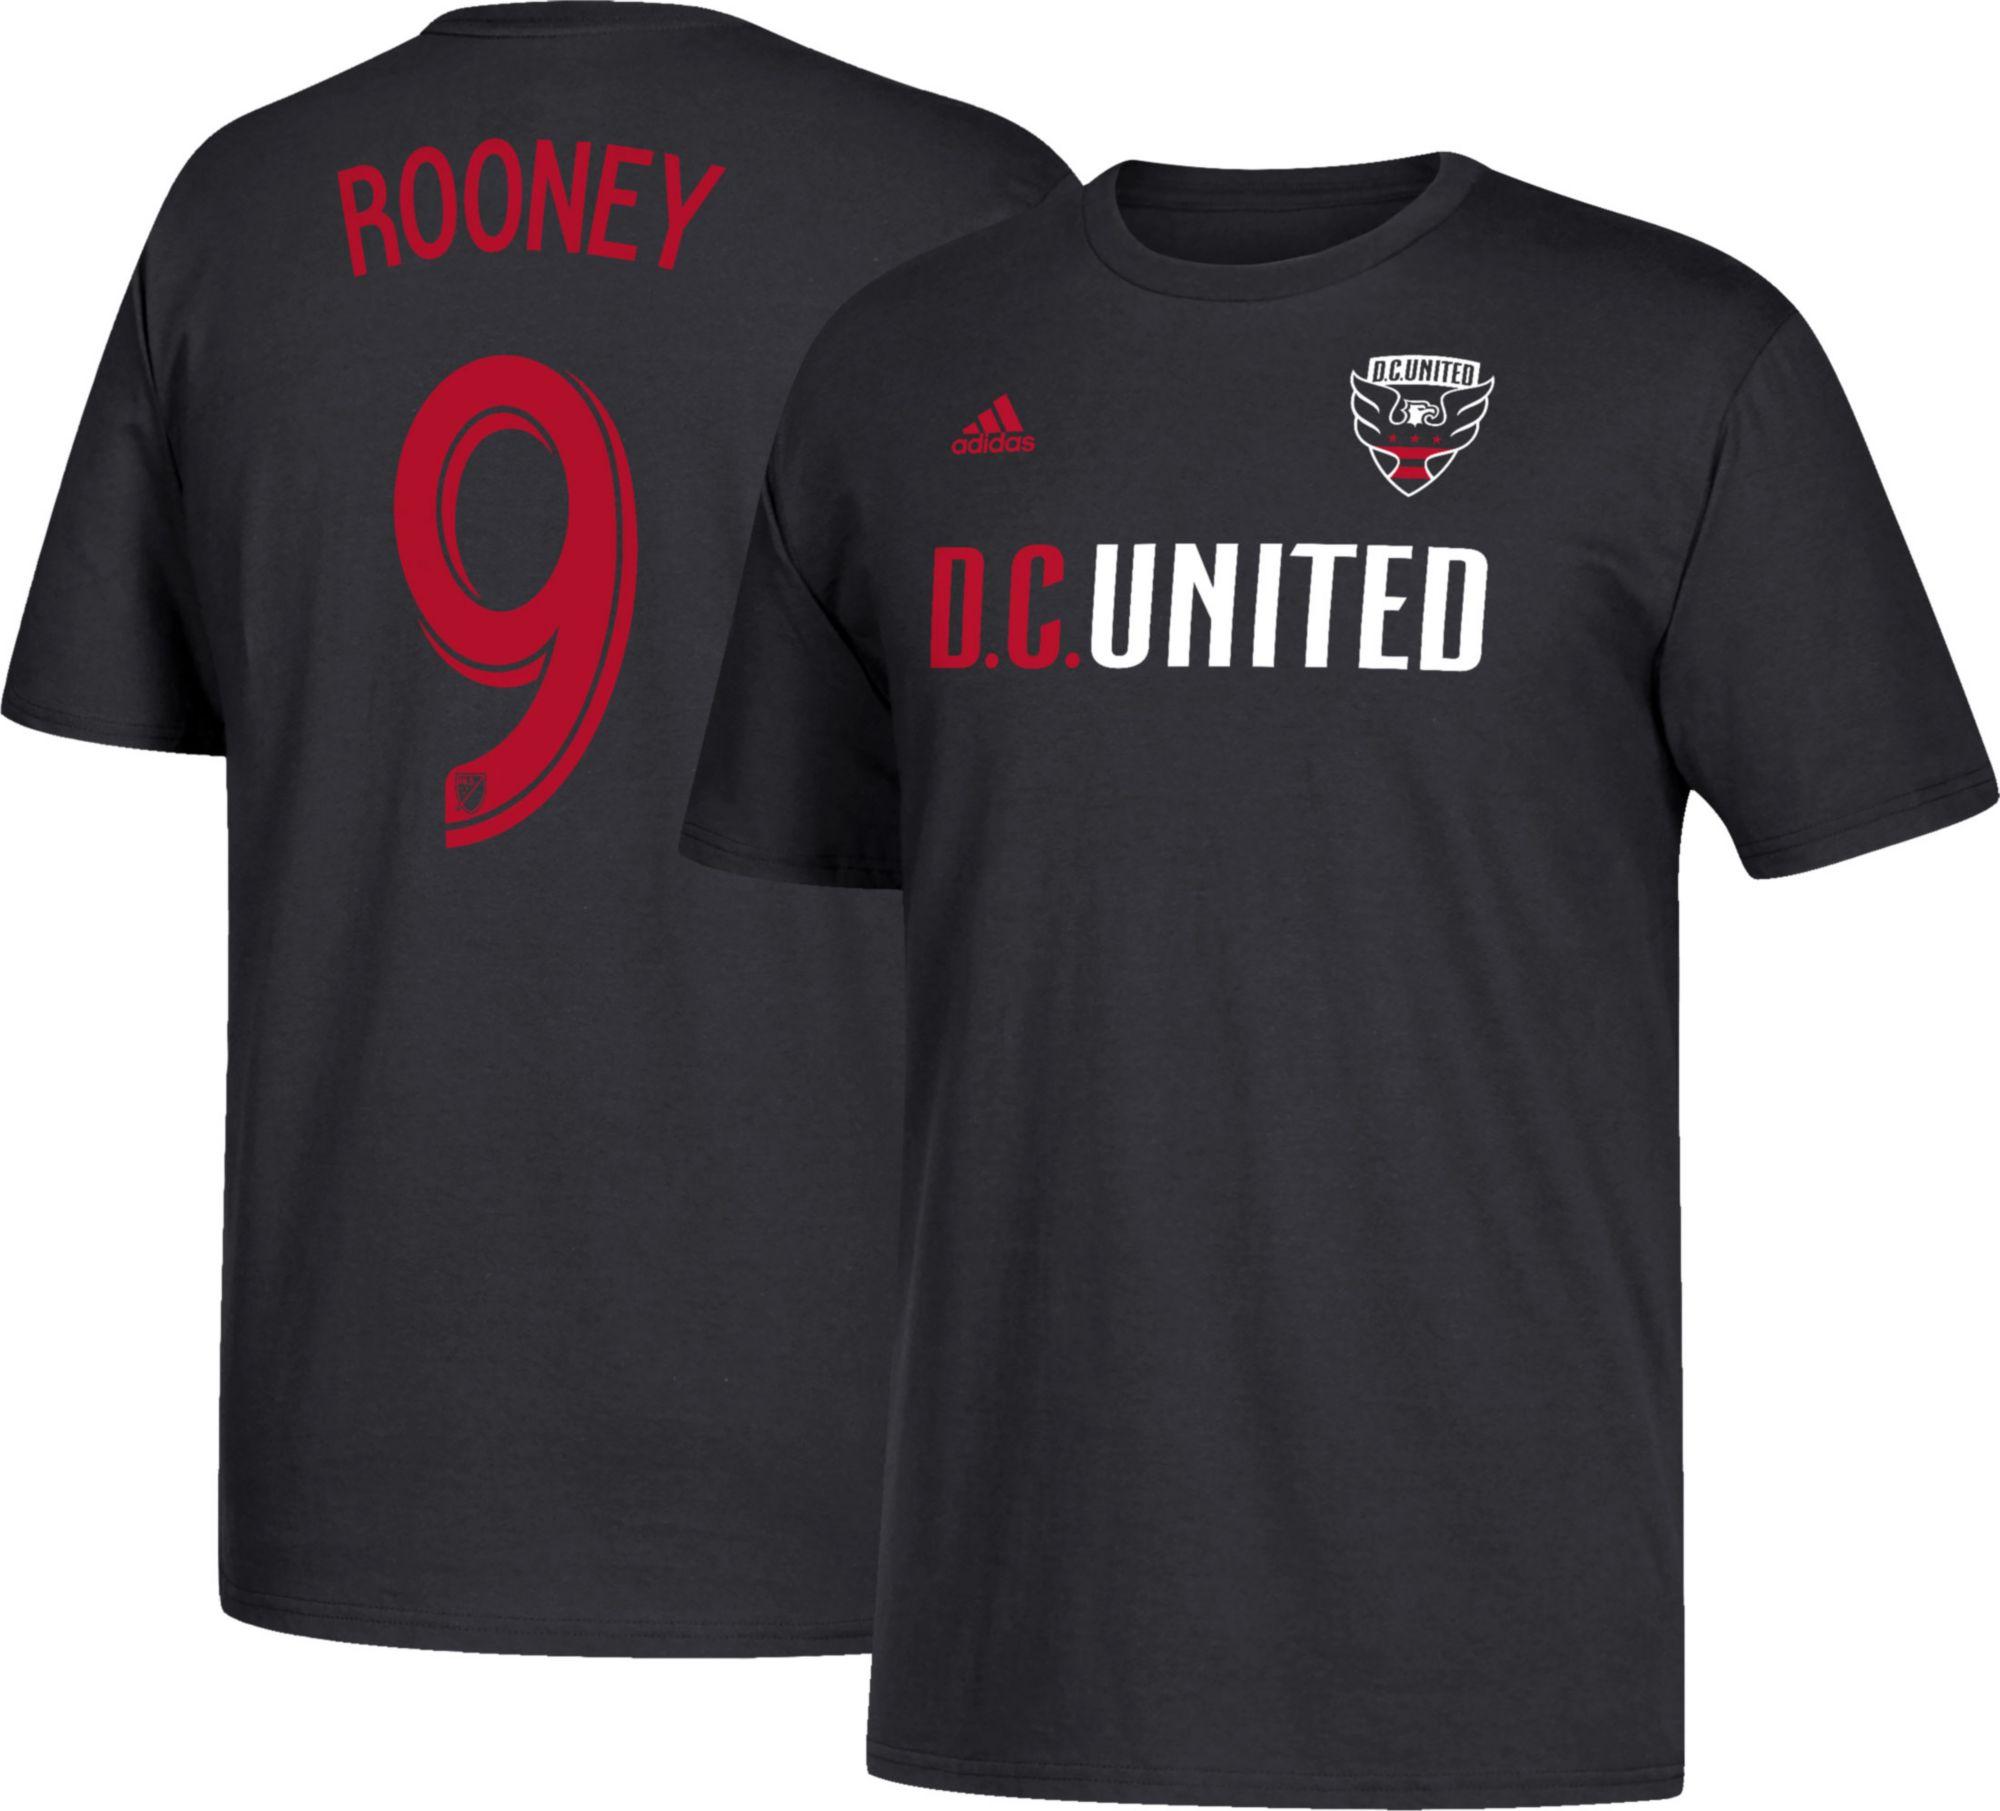 rooney jersey